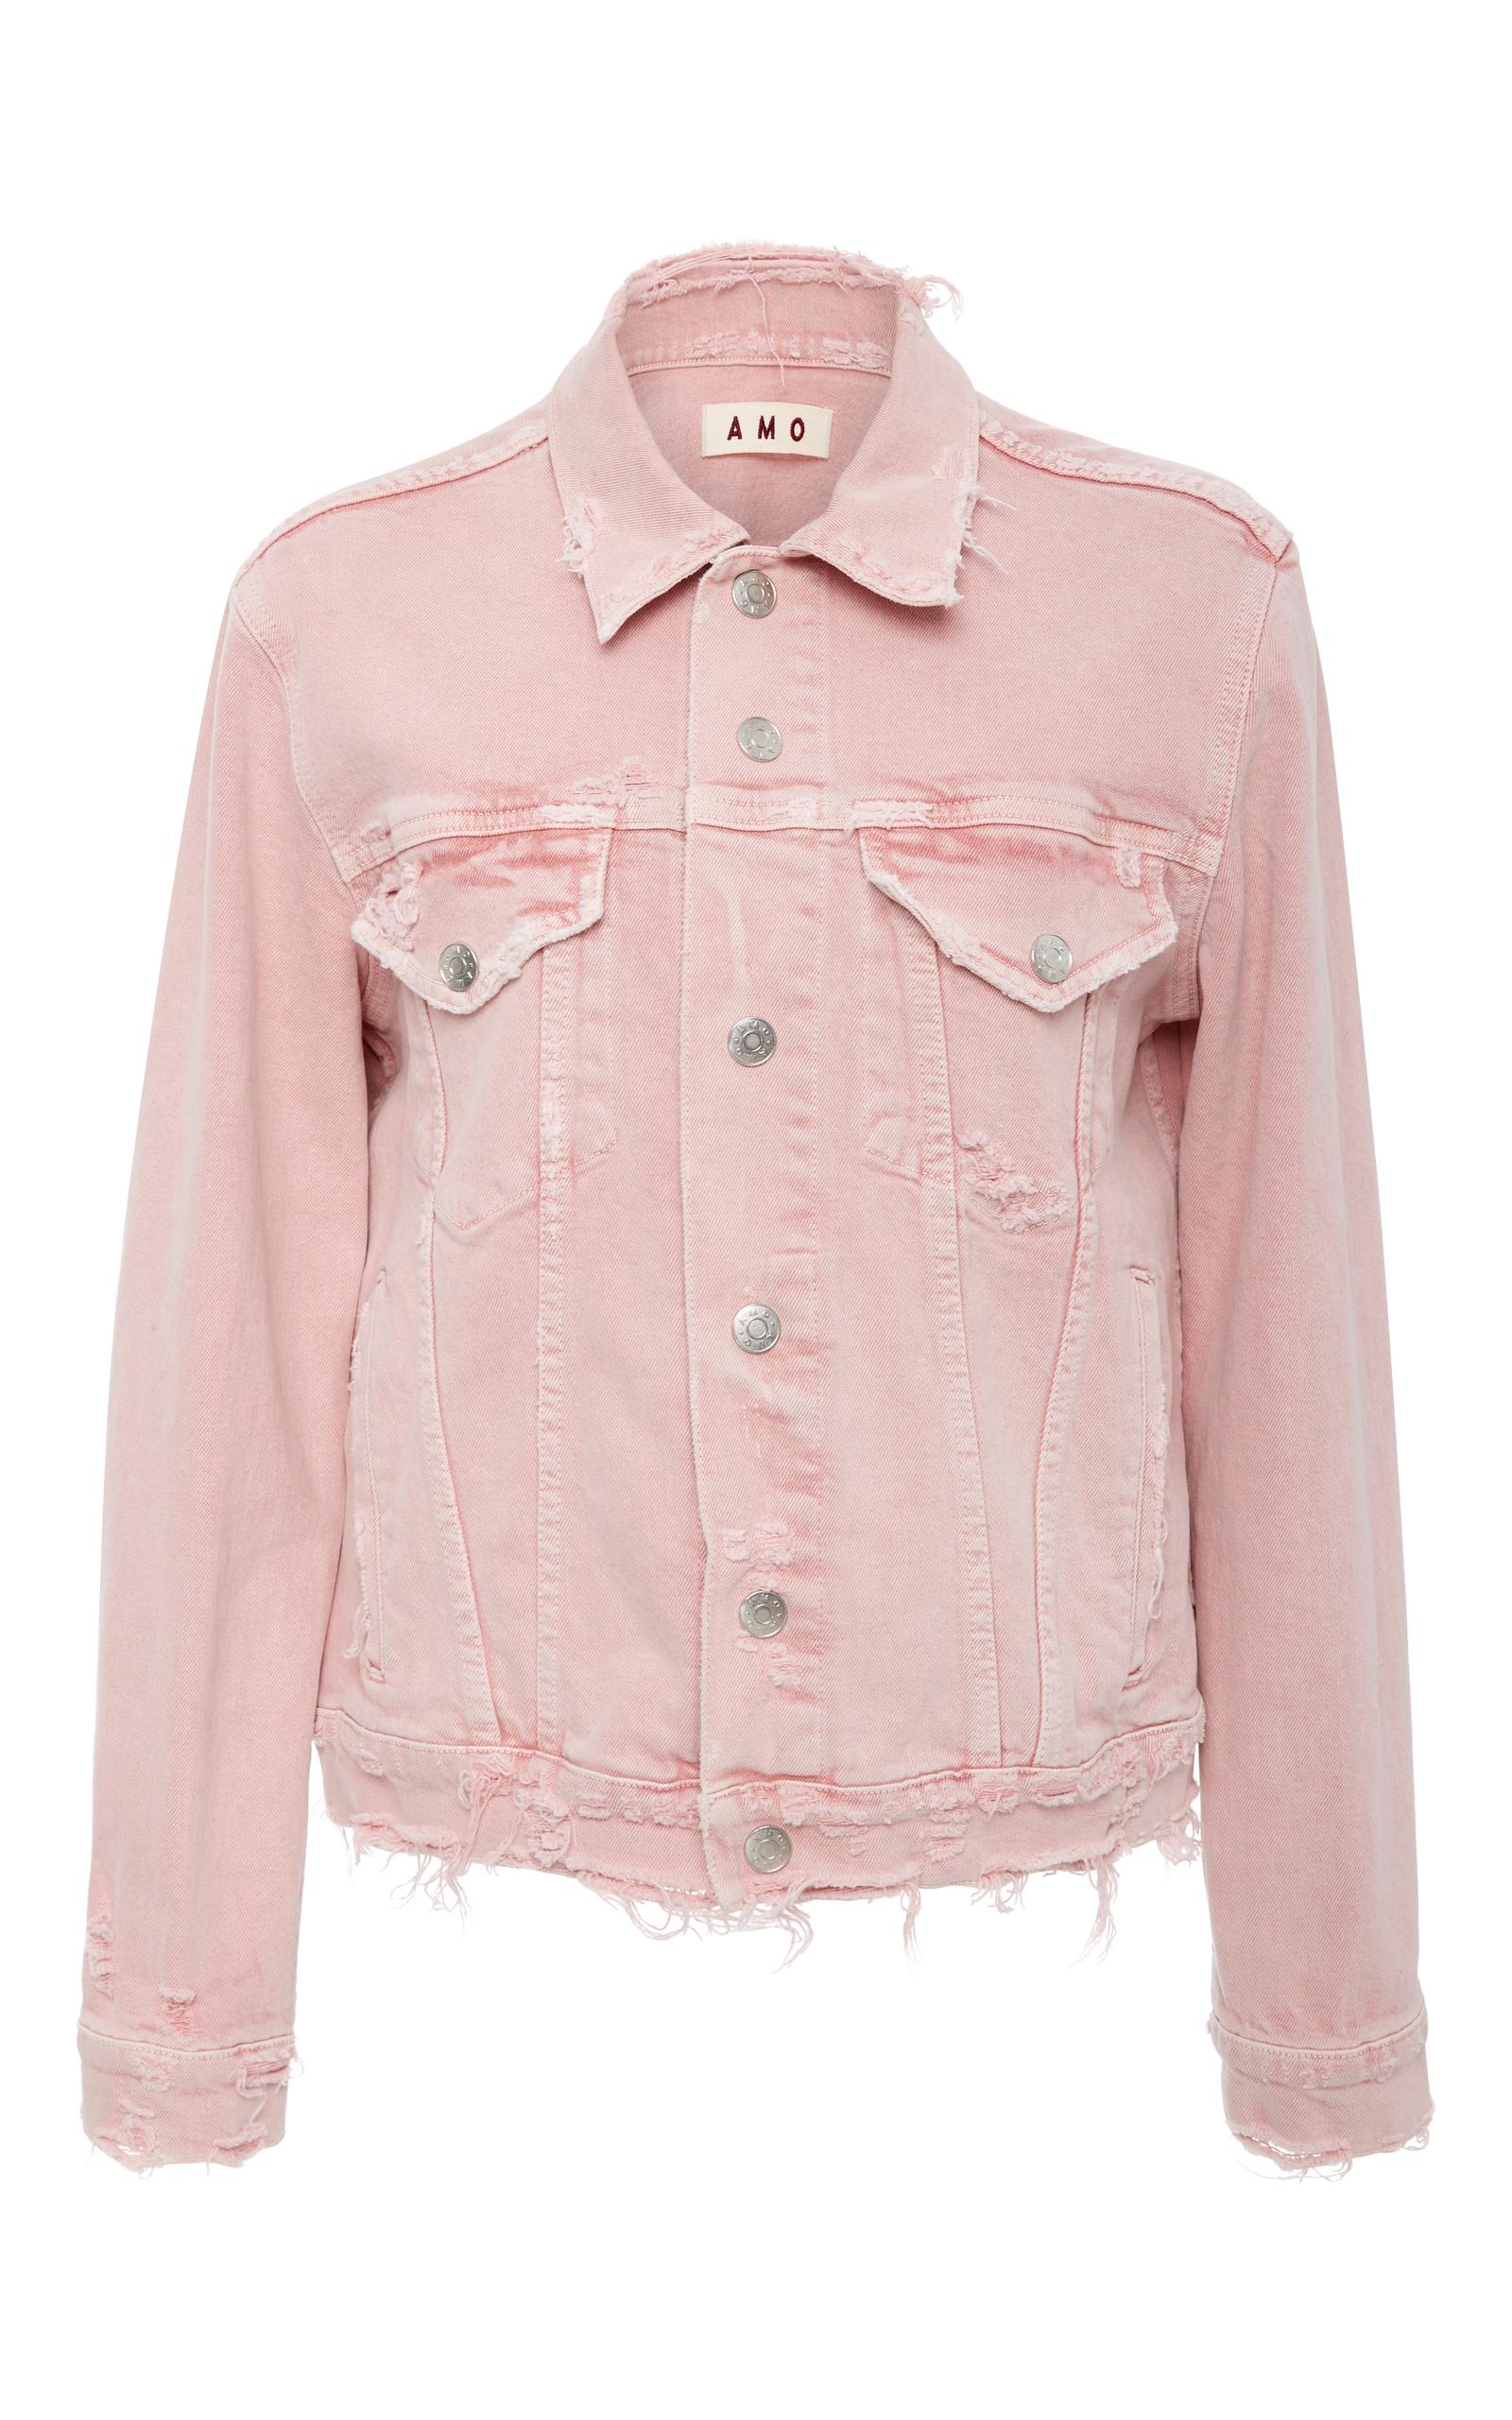 Moda Operandi | Vintage Stretch Pink Denim Jacket by AMO